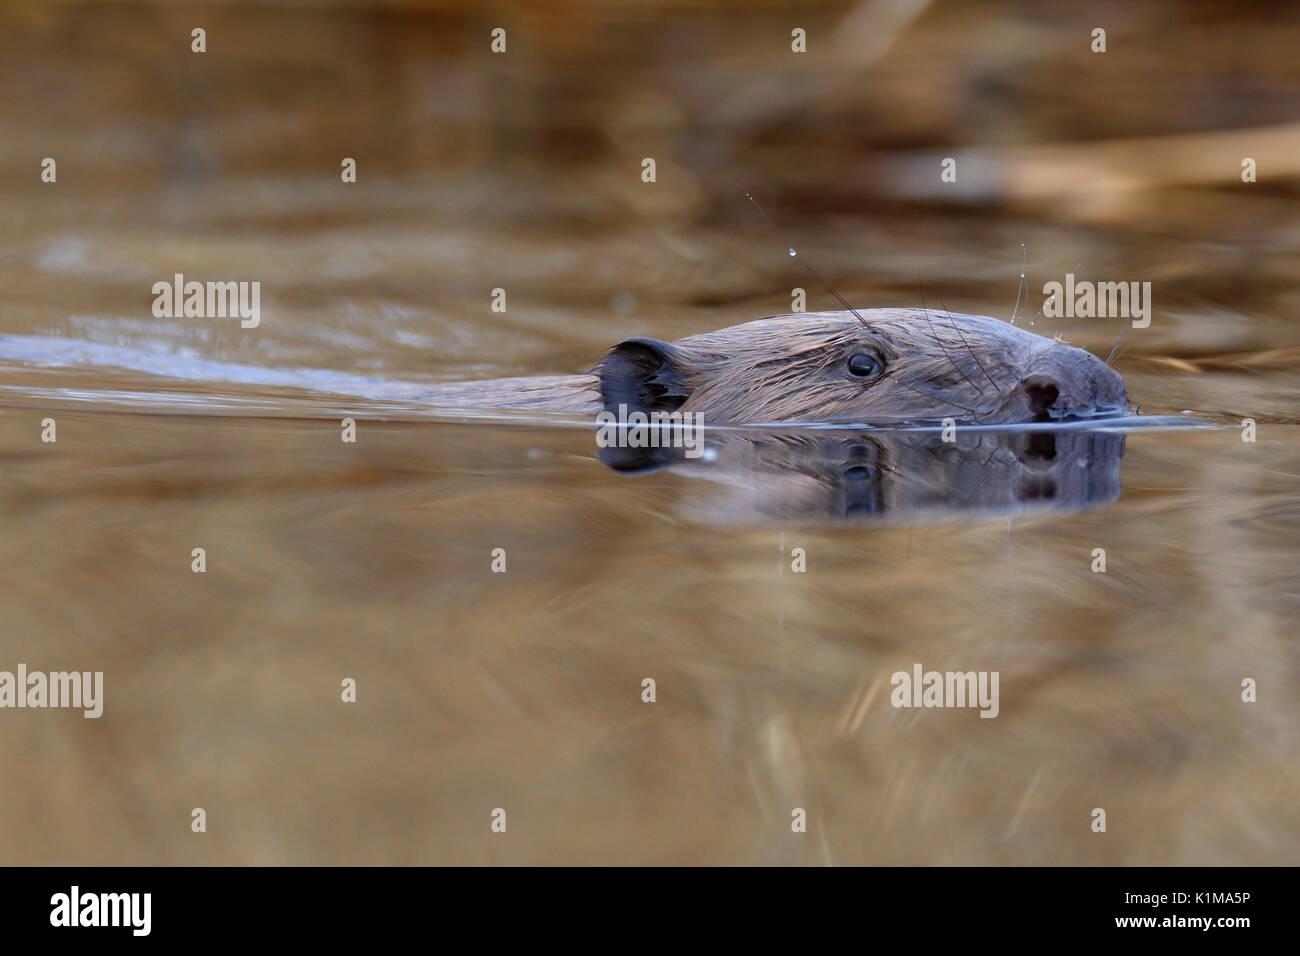 European beaver (Castor fiber) in water, portrait, Naturpark Flusslandschaft Peenetal, Mecklenburg-Western Pomerania, - Stock Image